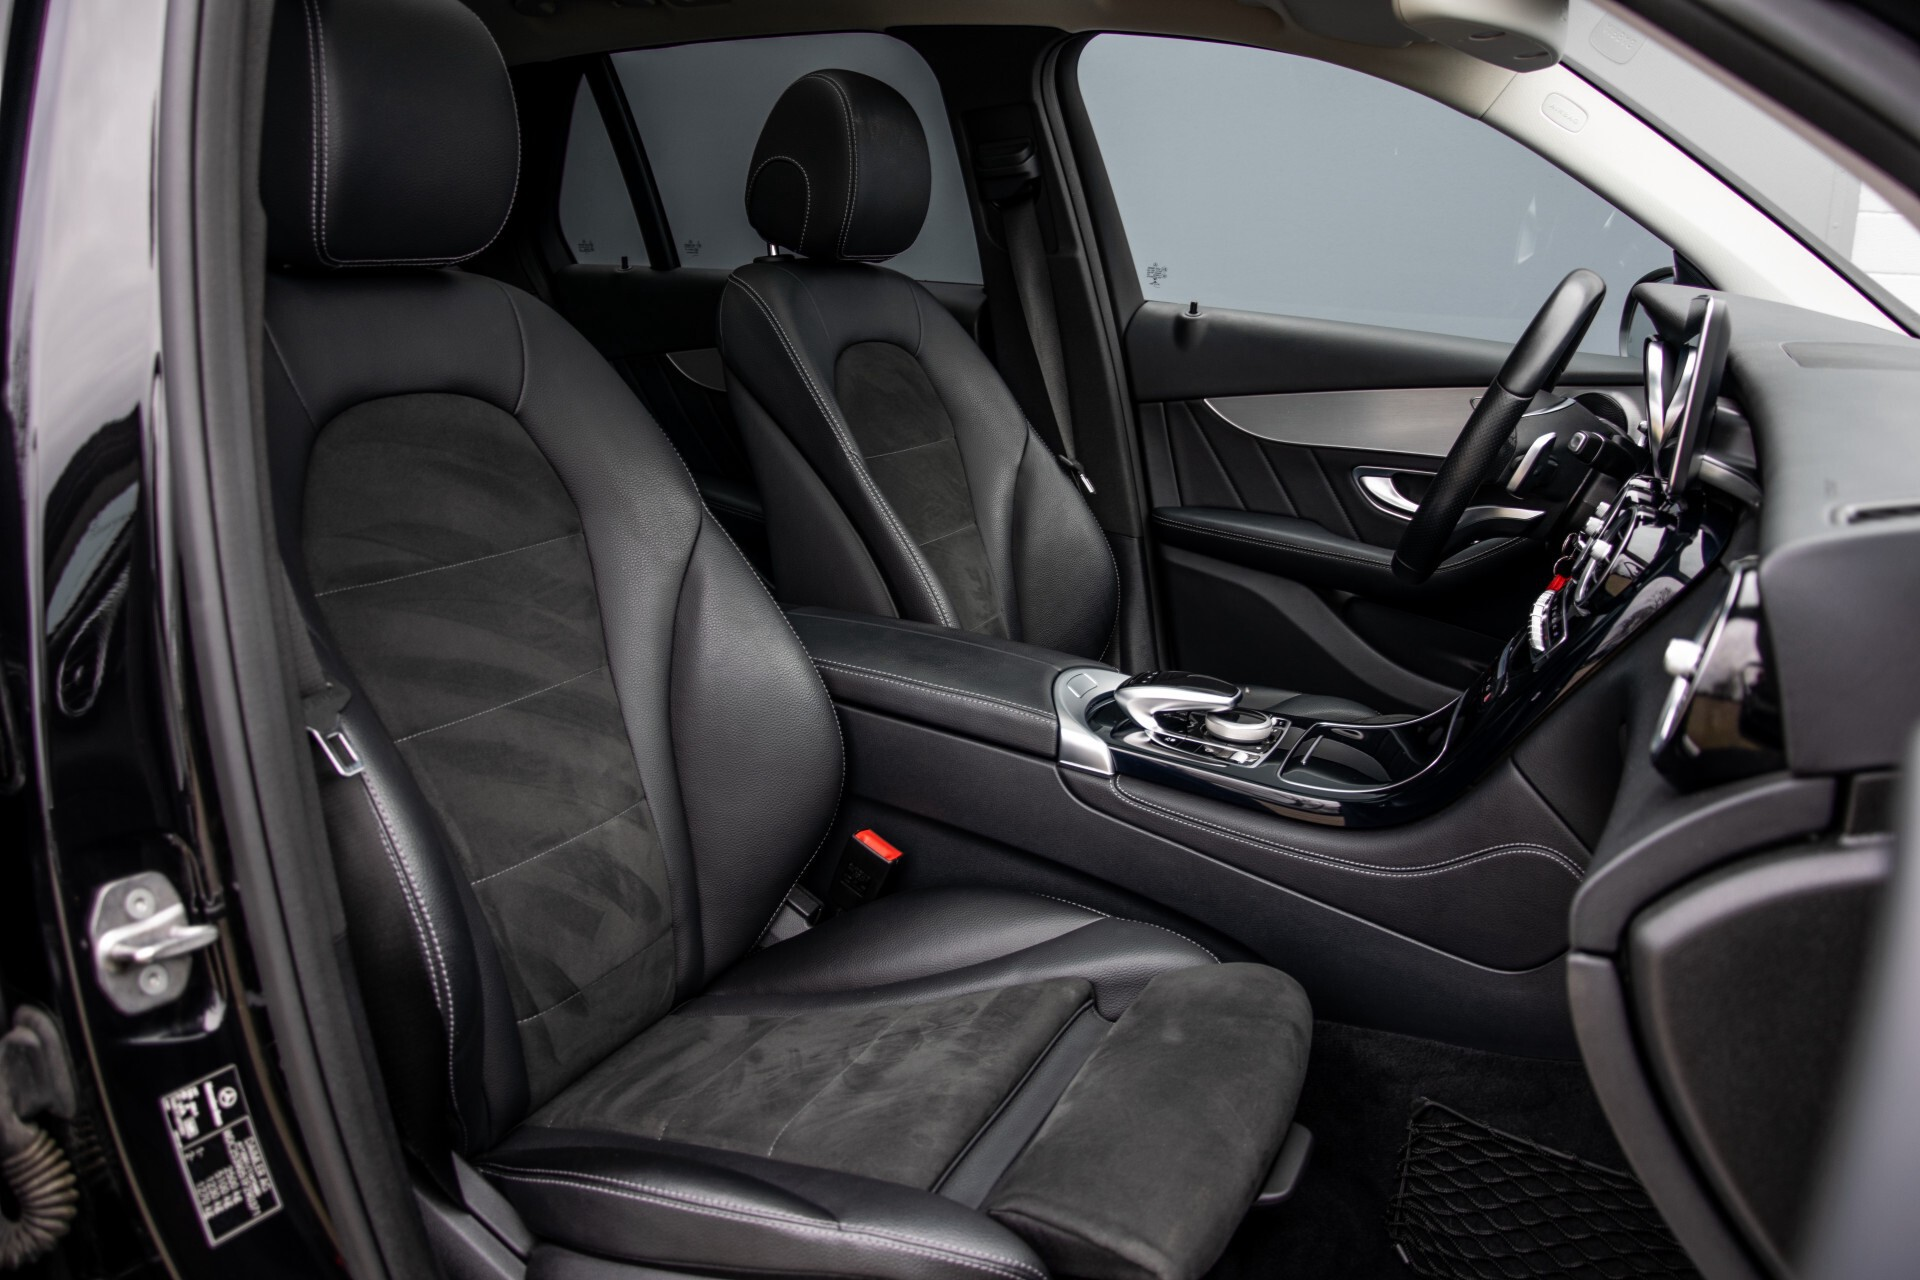 Mercedes-Benz GLC 220 d 4-M AMG/Distronic/Panorama/Comand/HUD/Afn-Trhk Aut9 Foto 3